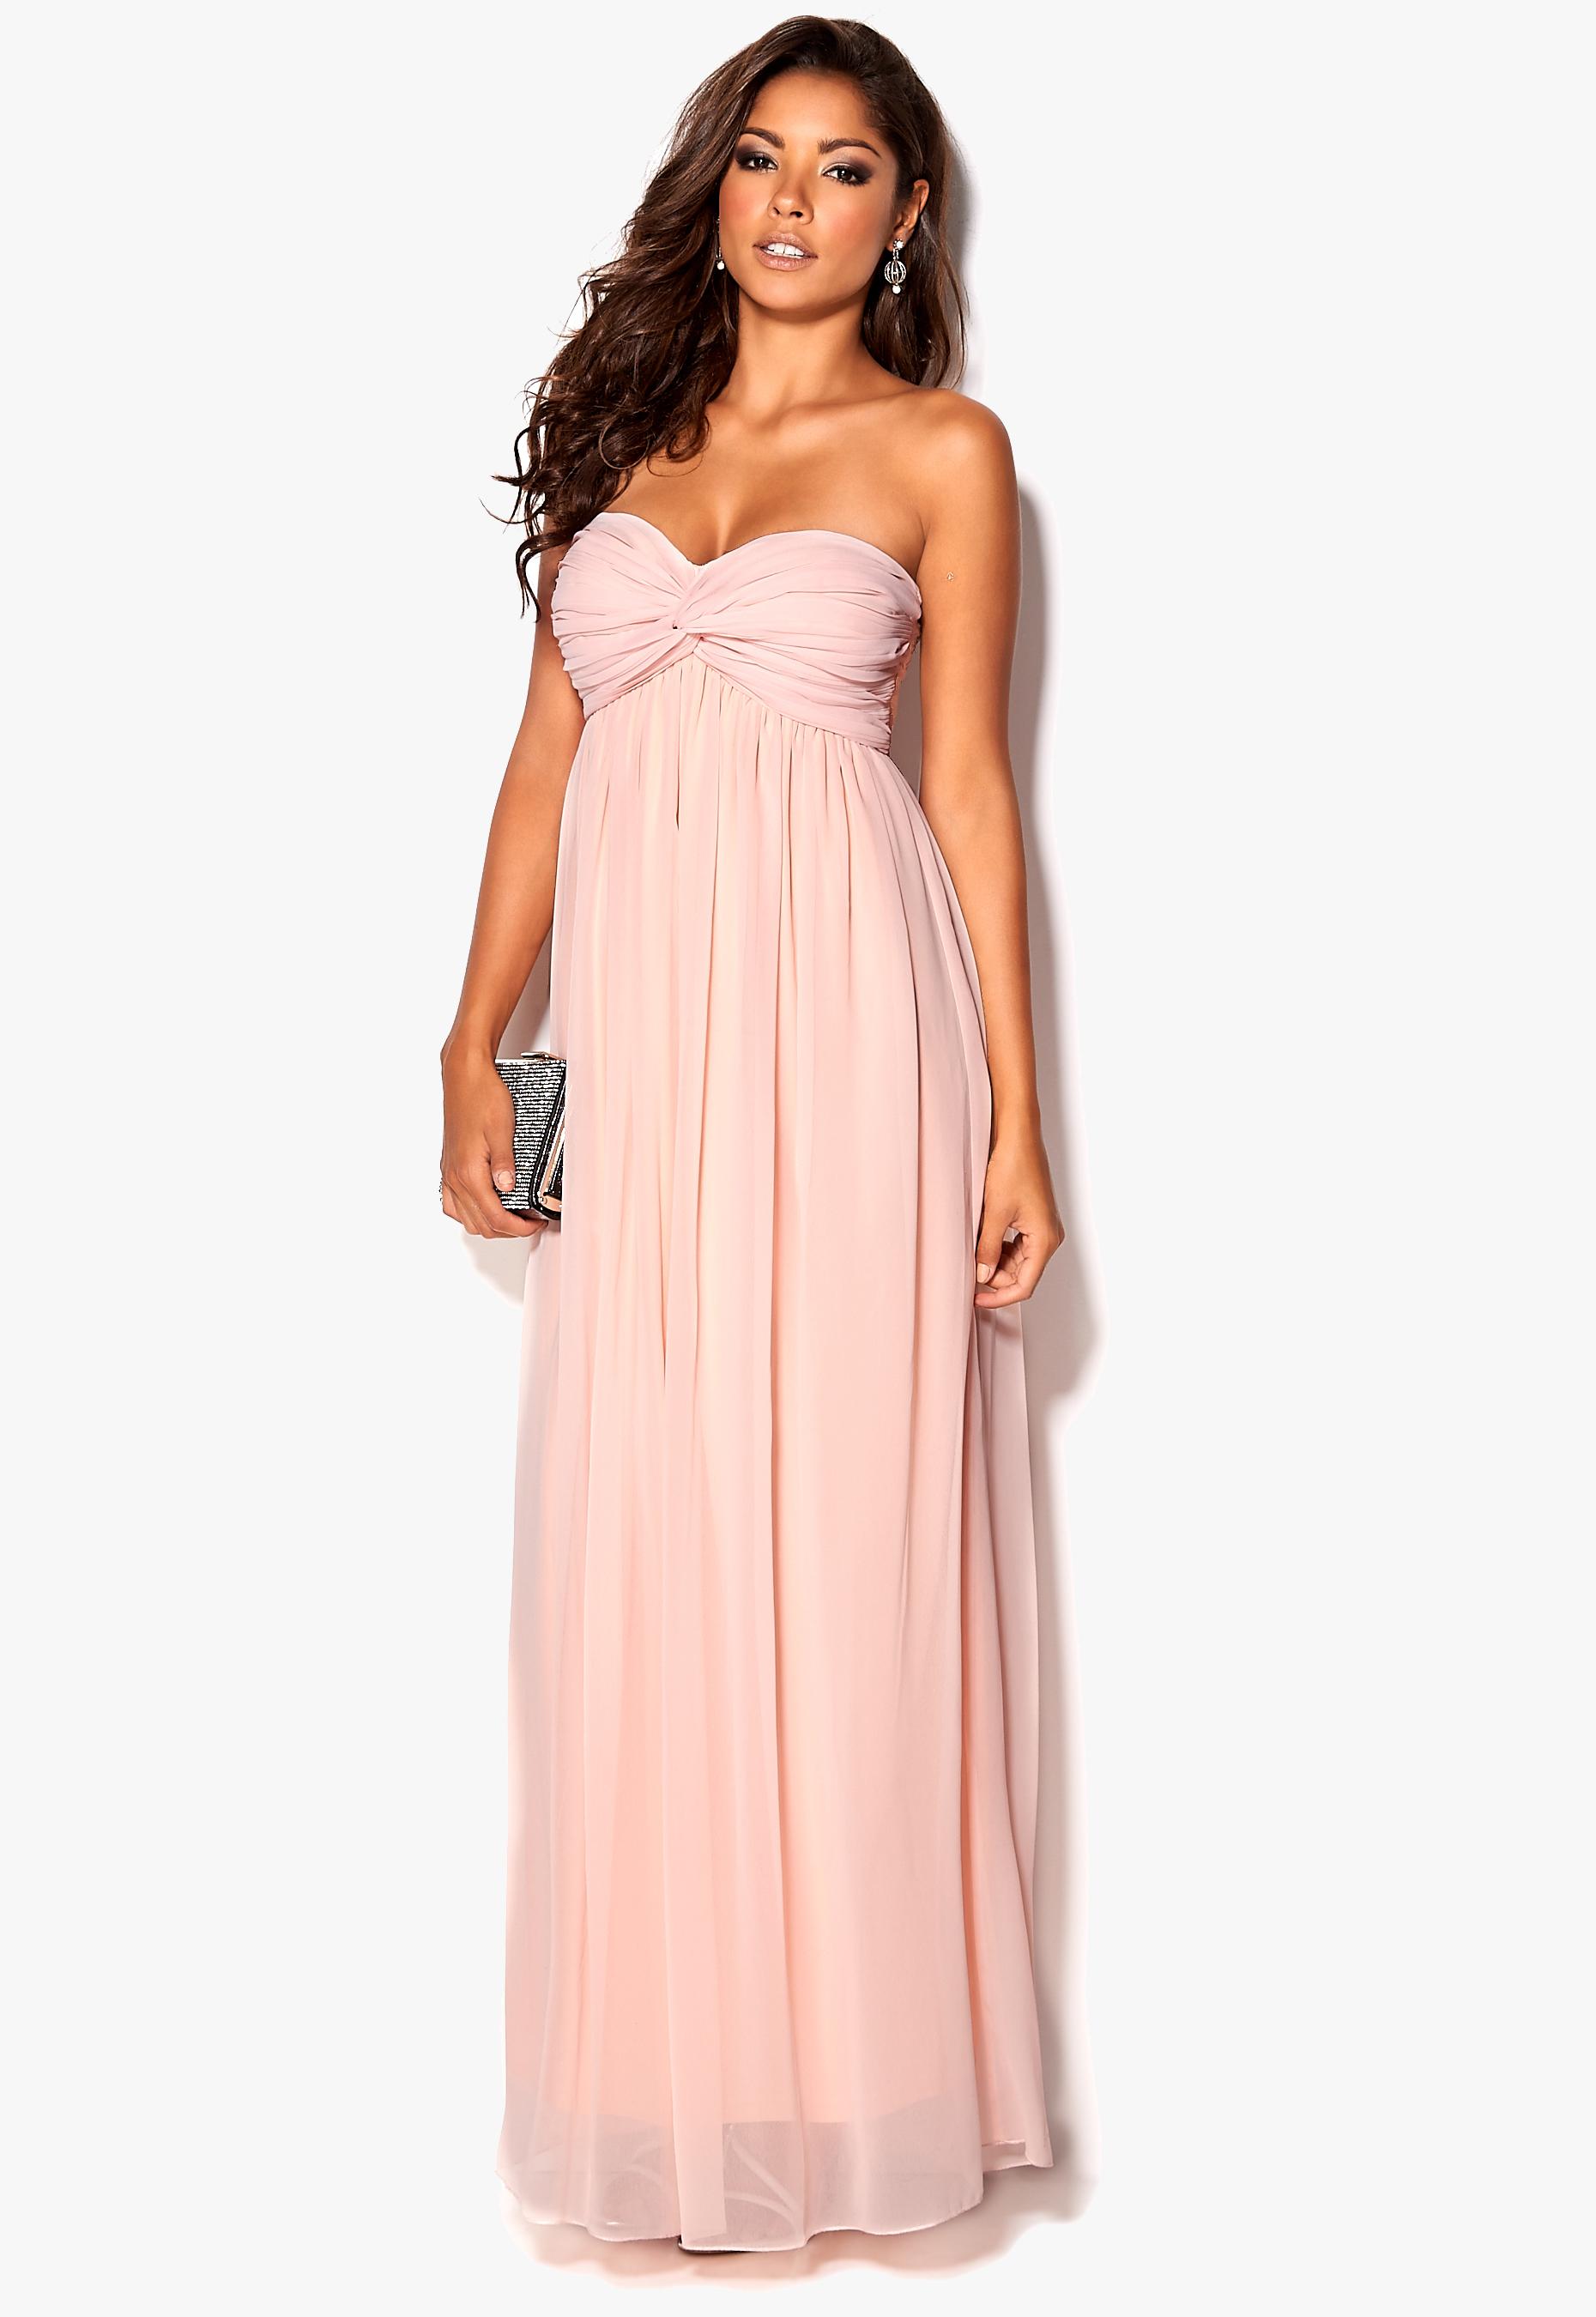 8d67e5499058 Chiara Forthi Jasmine Dress Light Pink - Bubbleroom